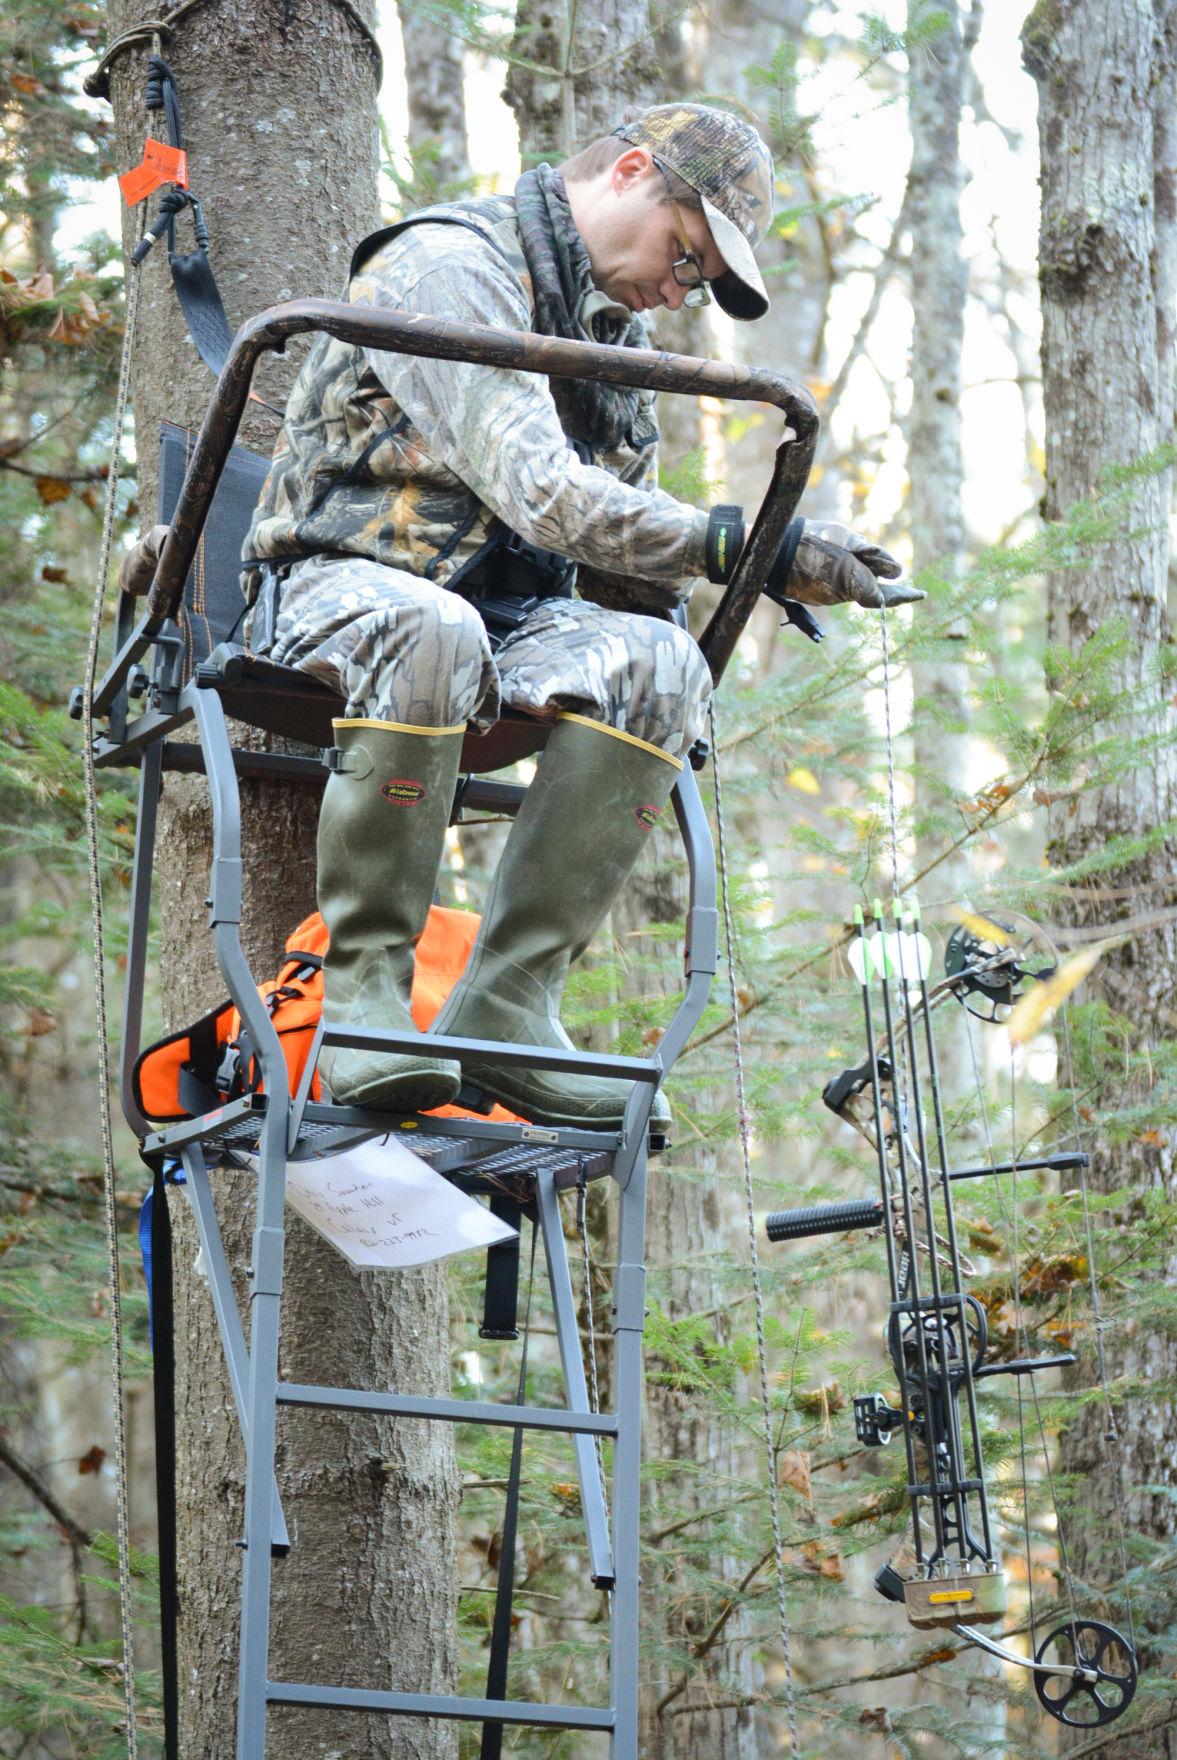 Treestand safety